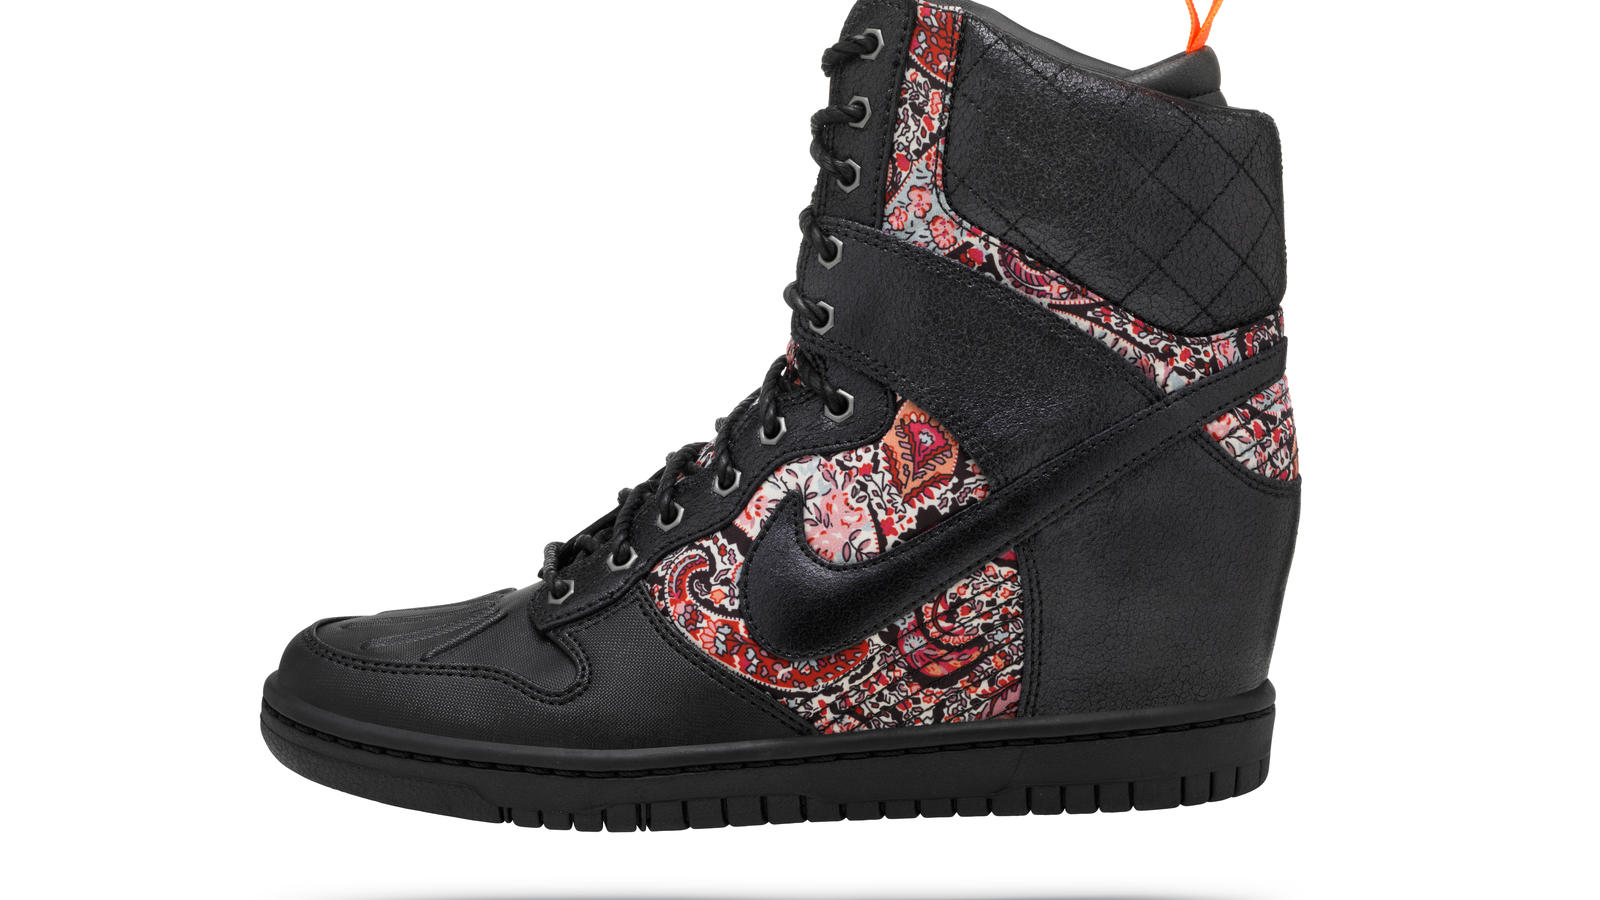 nike_dunk_sky_hi_sneakerboot_03